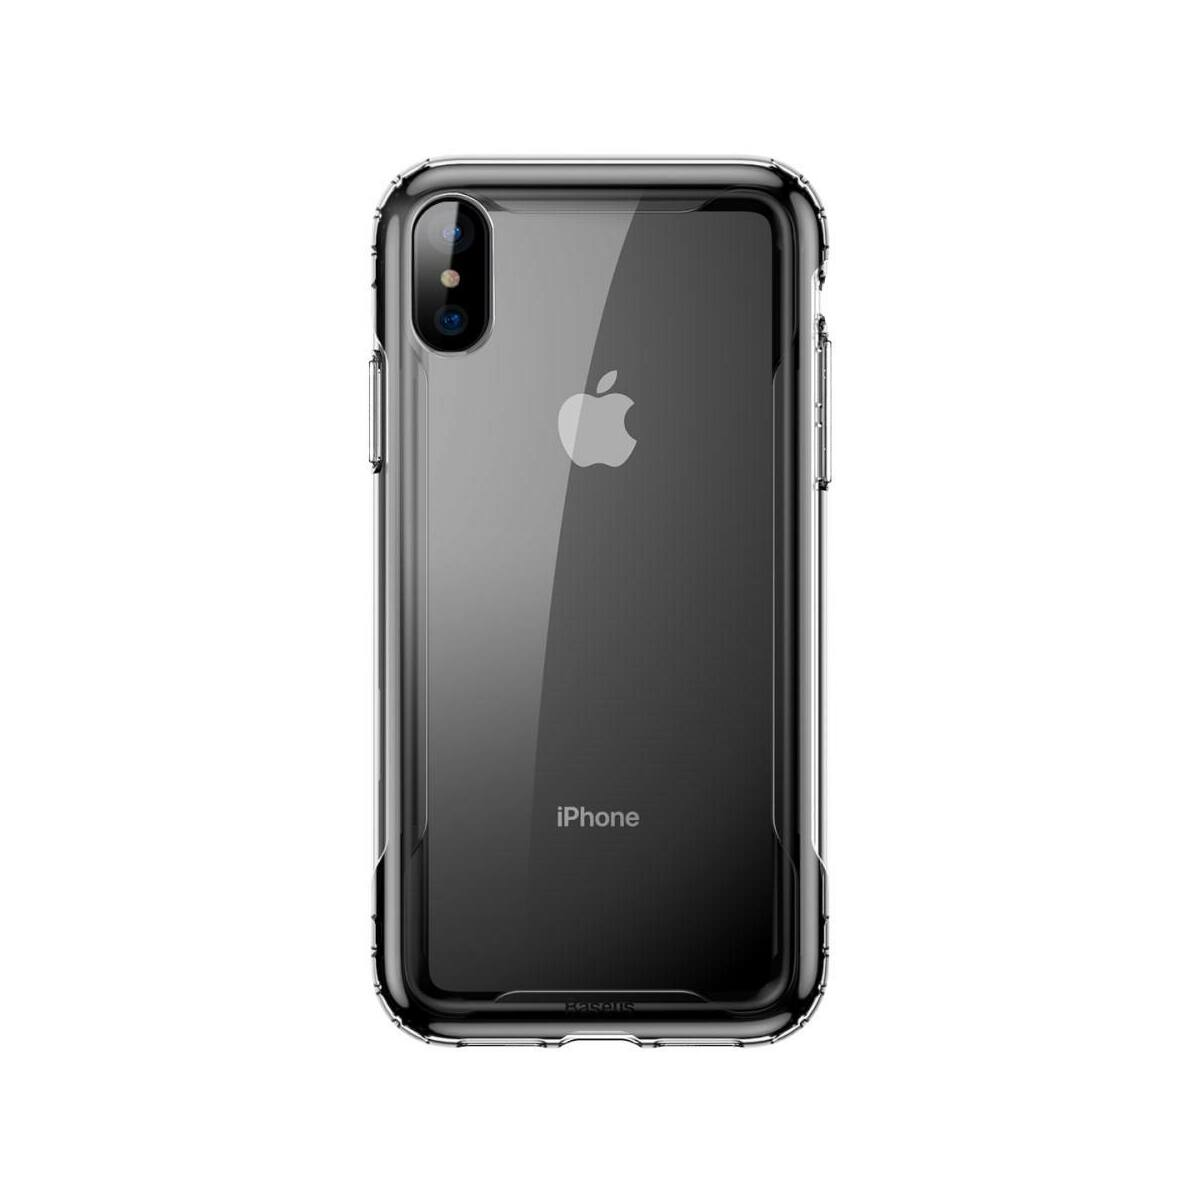 Baseus iPhone XS Max tok, Armor, fekete (WIAPIPH65-YJ01)